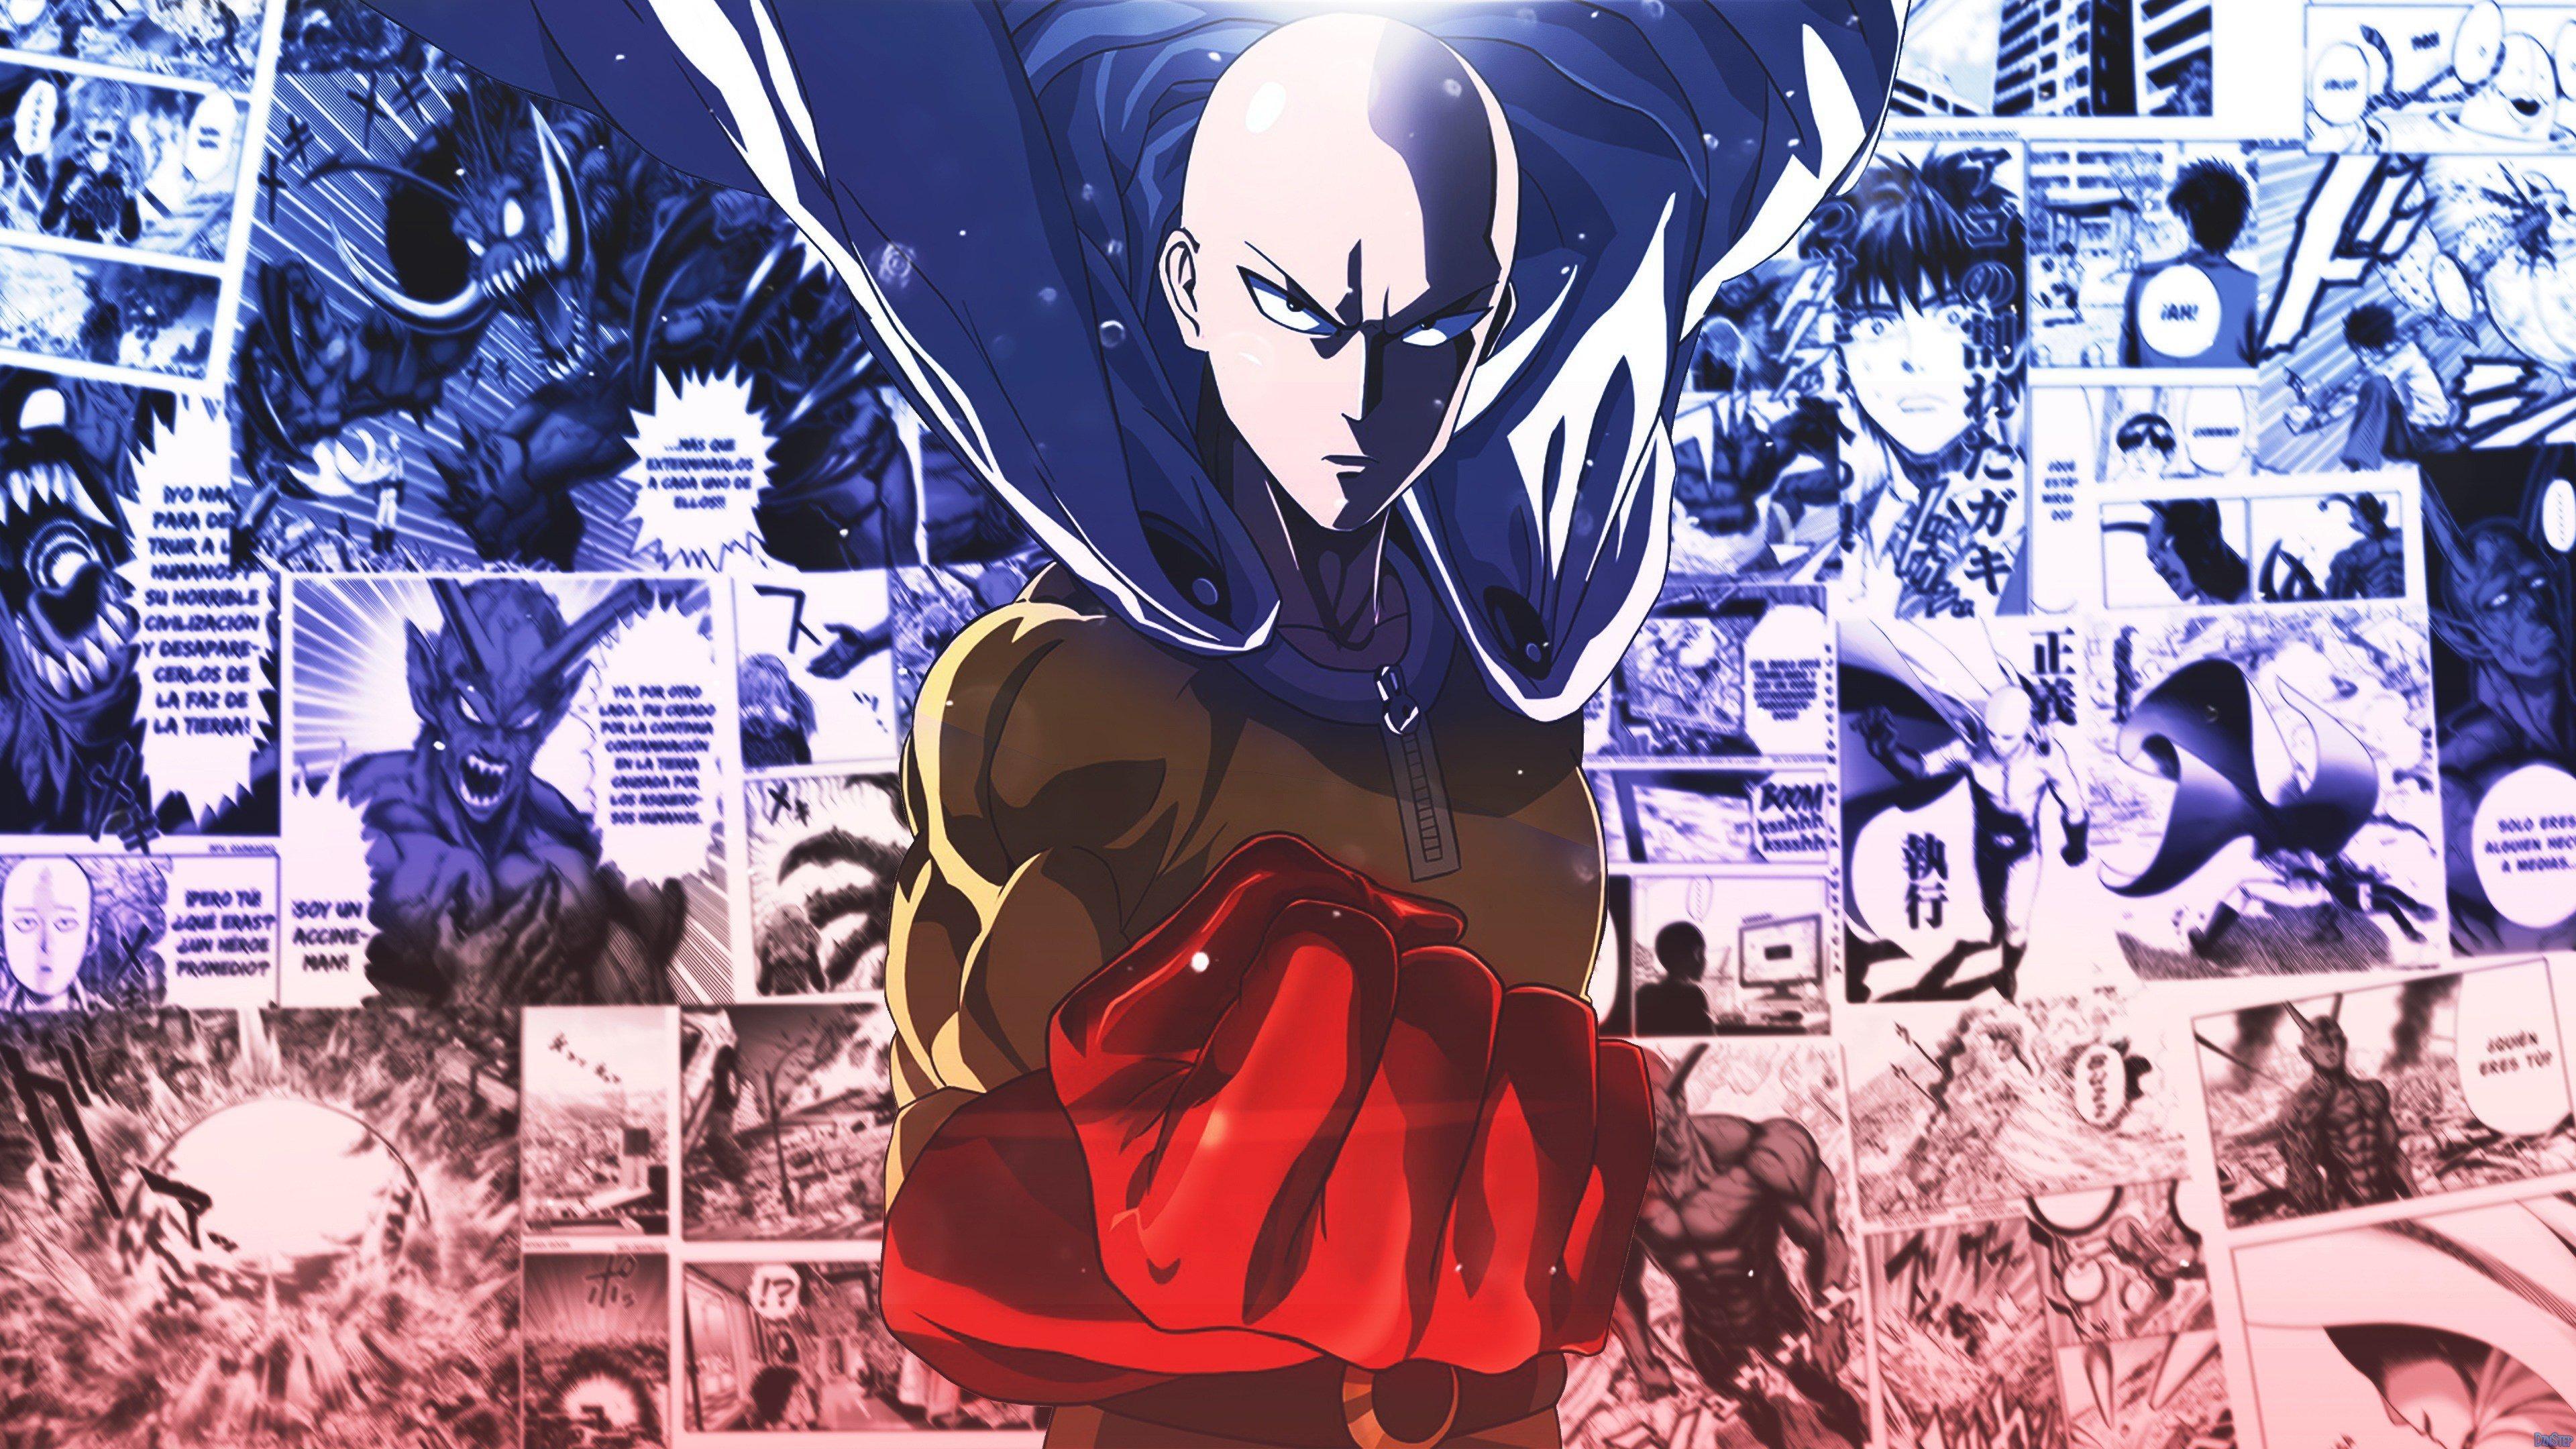 Download 3840x2400 wallpaper saitama onepunch man anime - Anime background wallpaper 4k ...